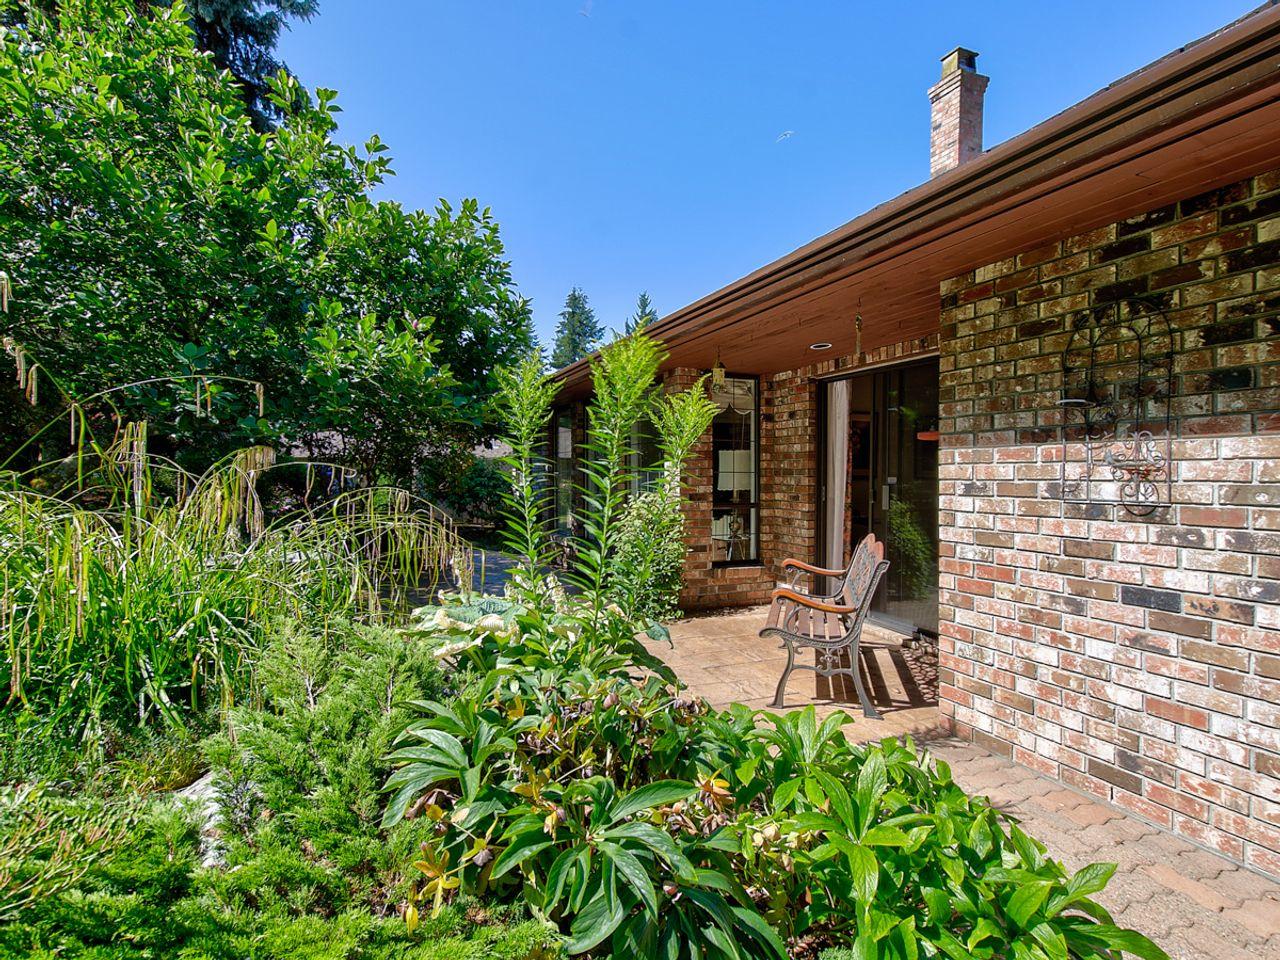 1729-southmere-cres-13 at 1729 Southmere Crescent, Sunnyside Park, Surrey